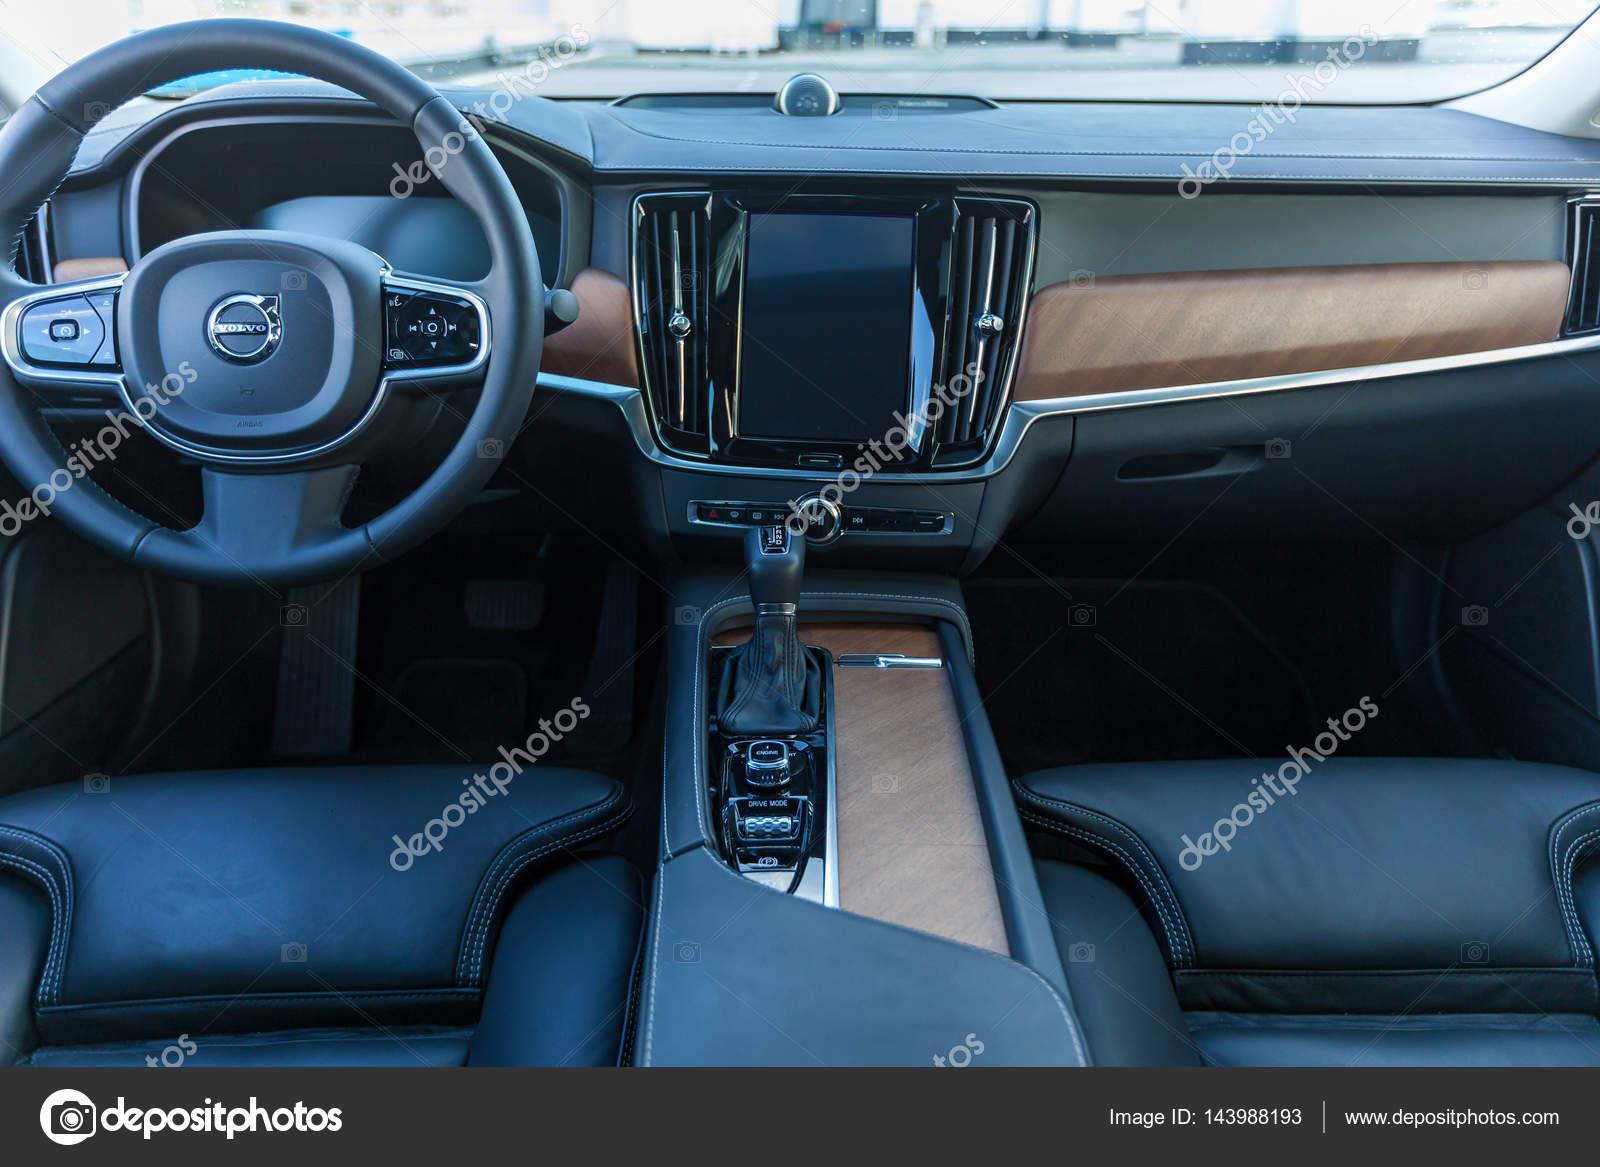 Interieur Auto Volvo S90 — Redaktionelles Stockfoto © Oleg.0 #143988193